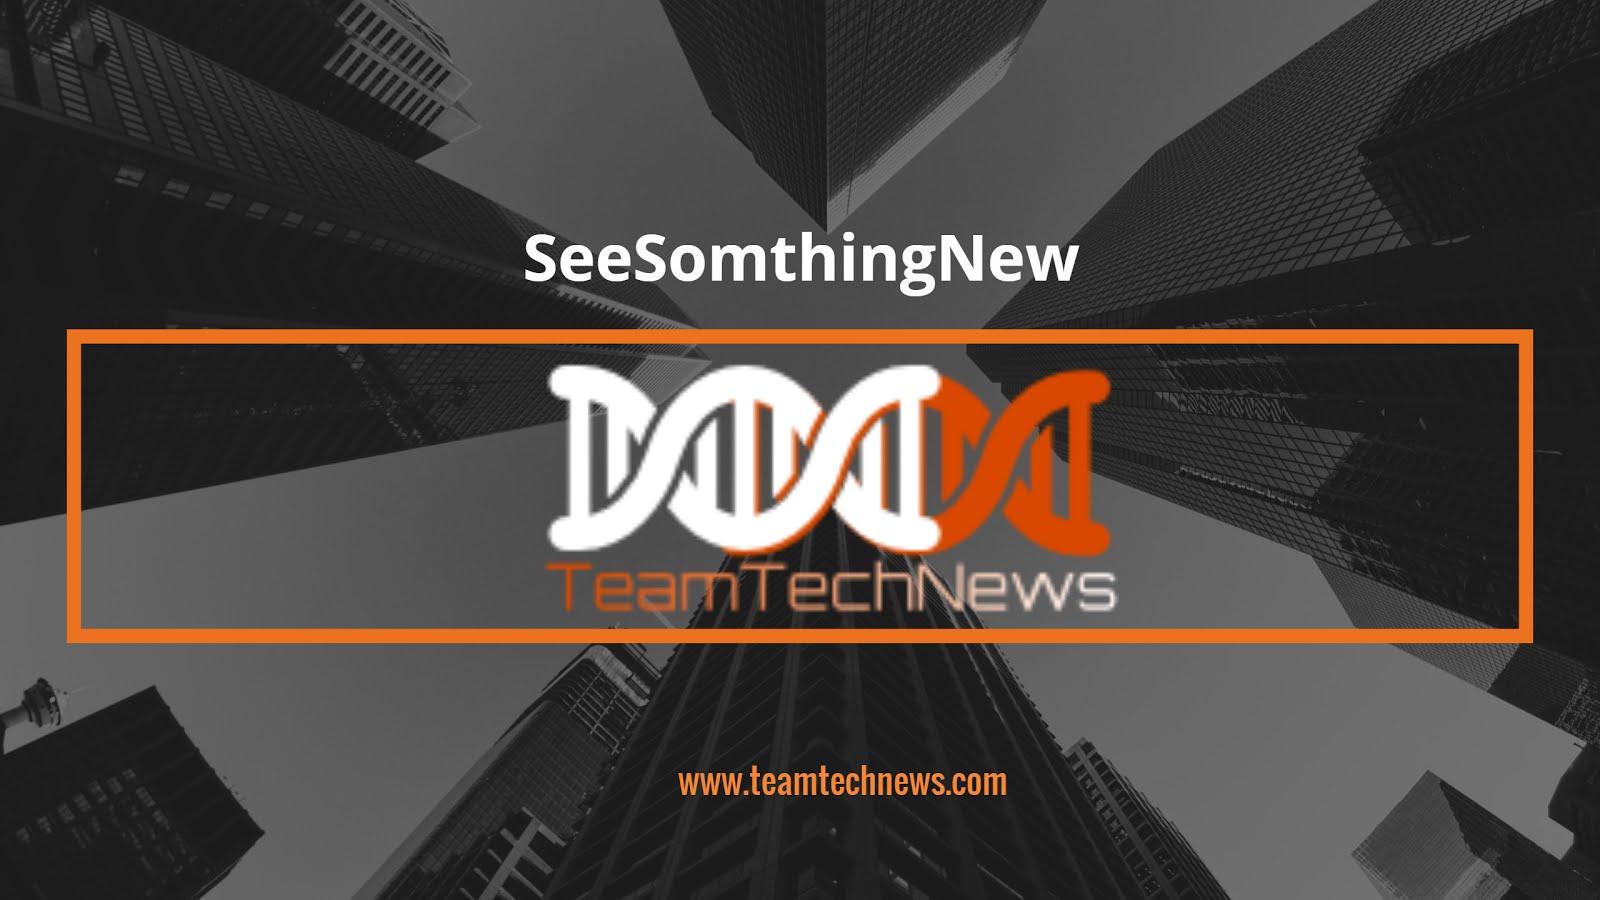 TeamTechNews